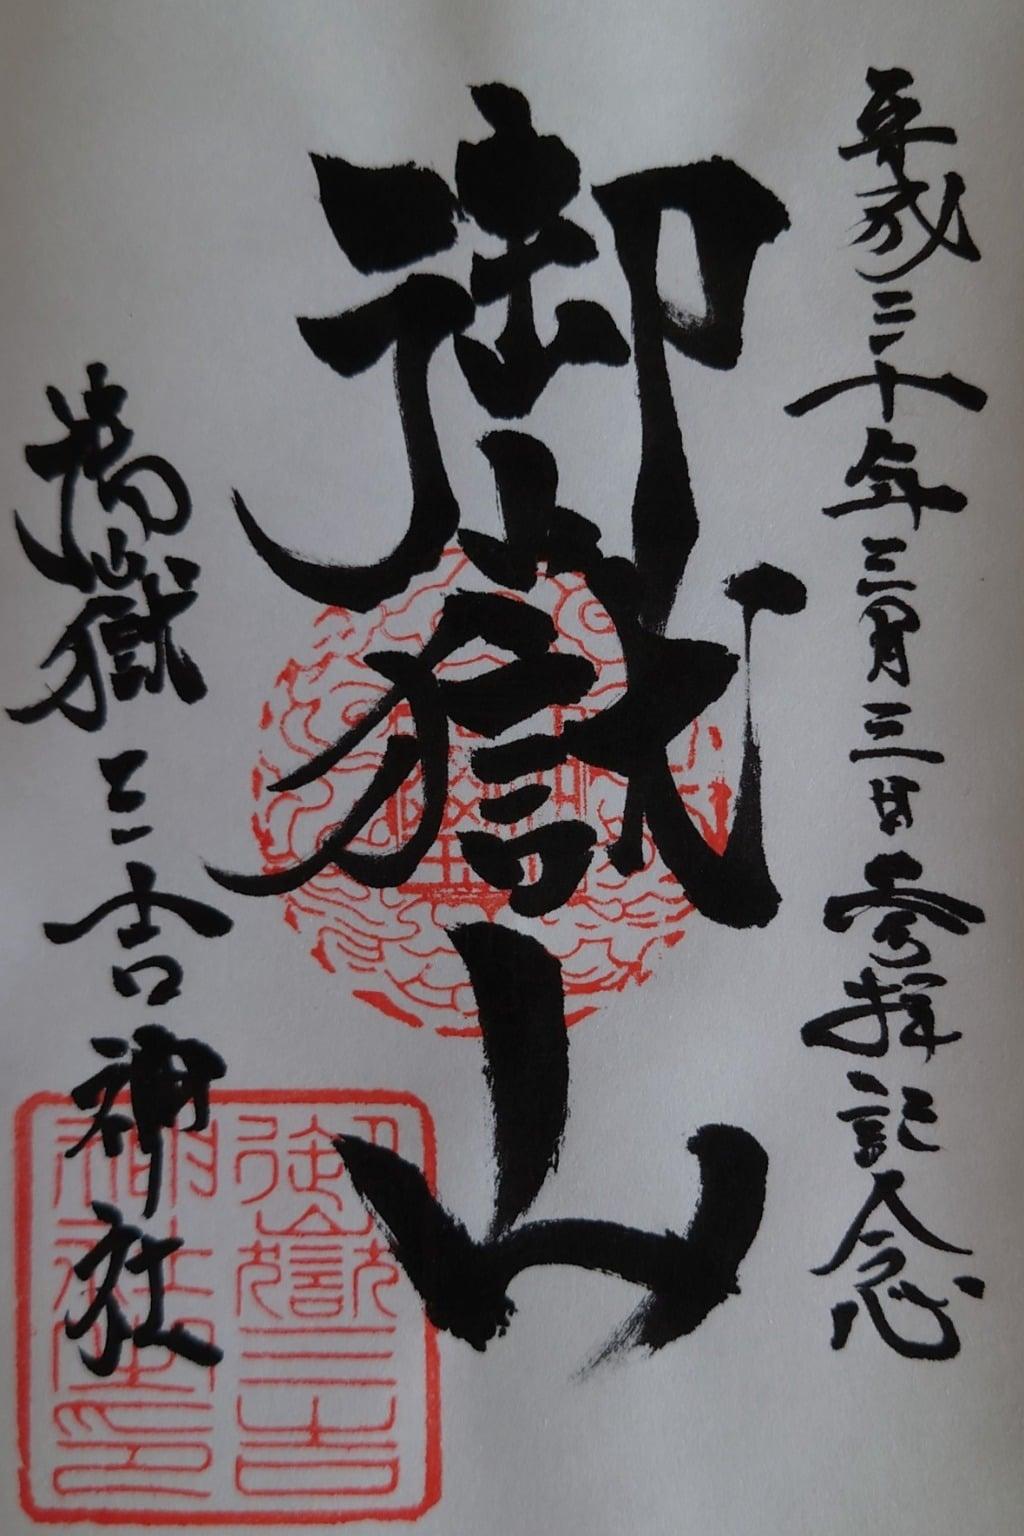 御嶽三吉神社の御朱印